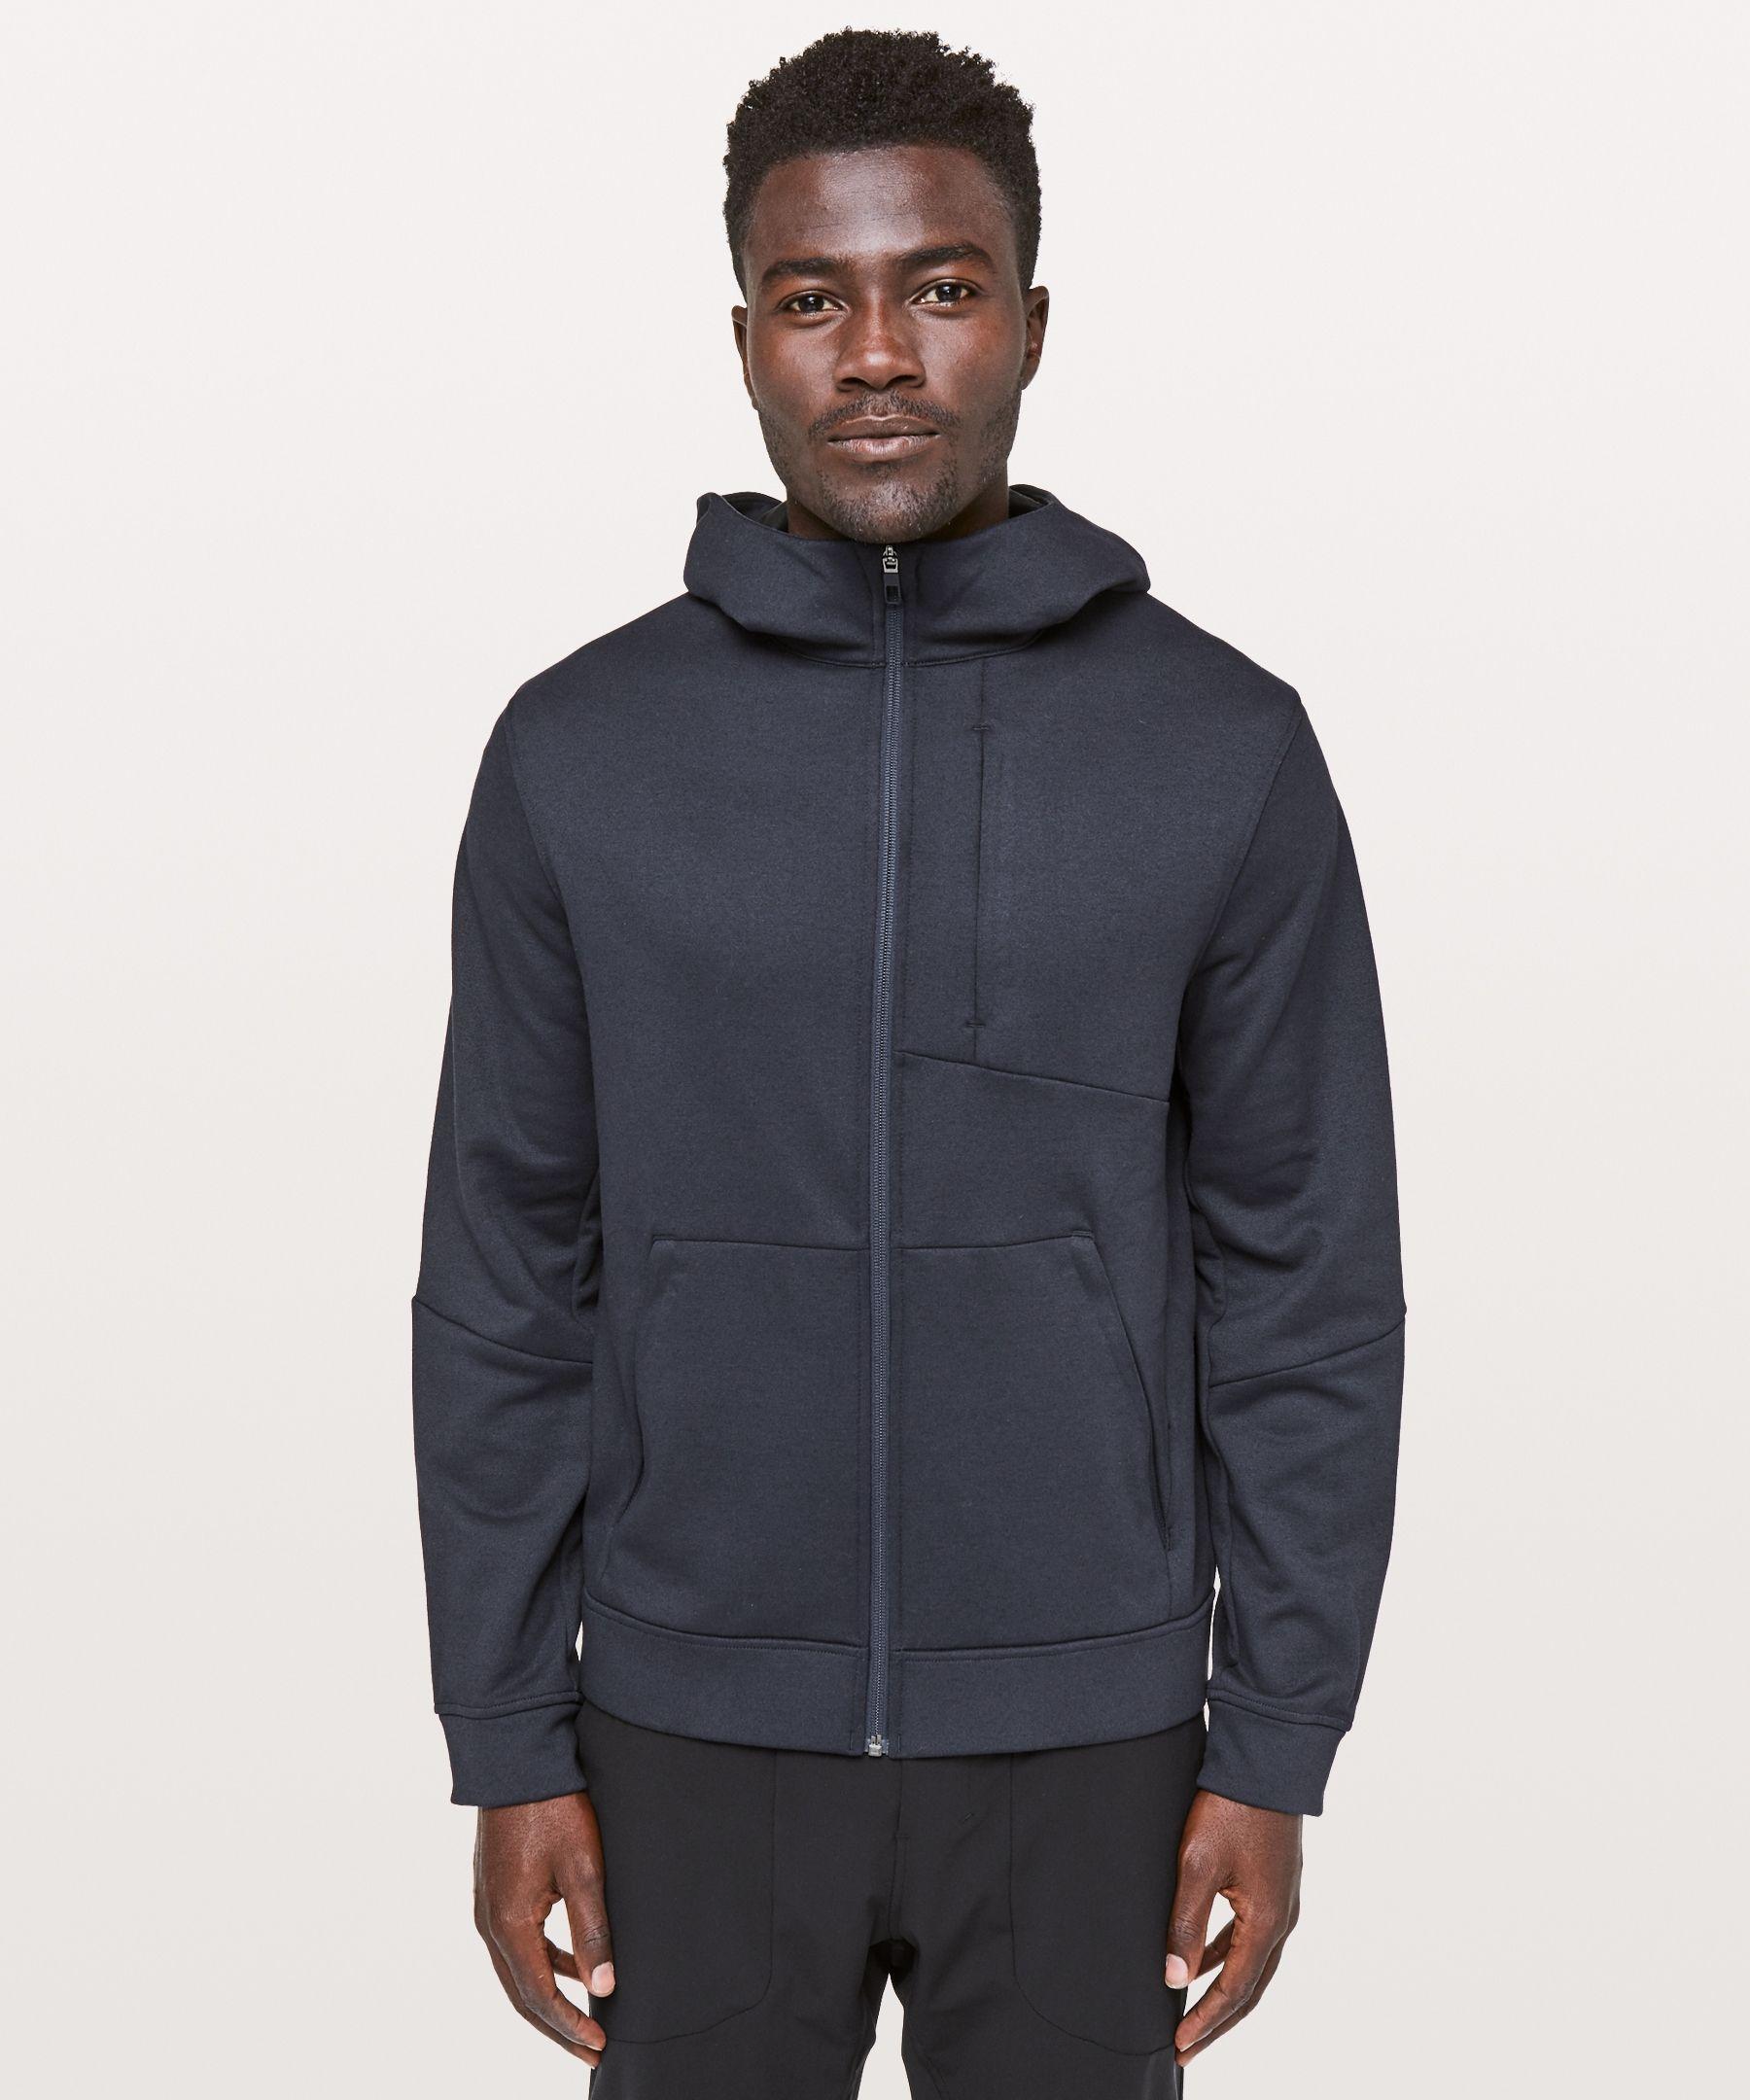 Lululemon Men S City Sweat Zip Hoodie Thermo Heathered Nautical Navy Size Xxl Mens Sweatshirts Hoodie Hoodies